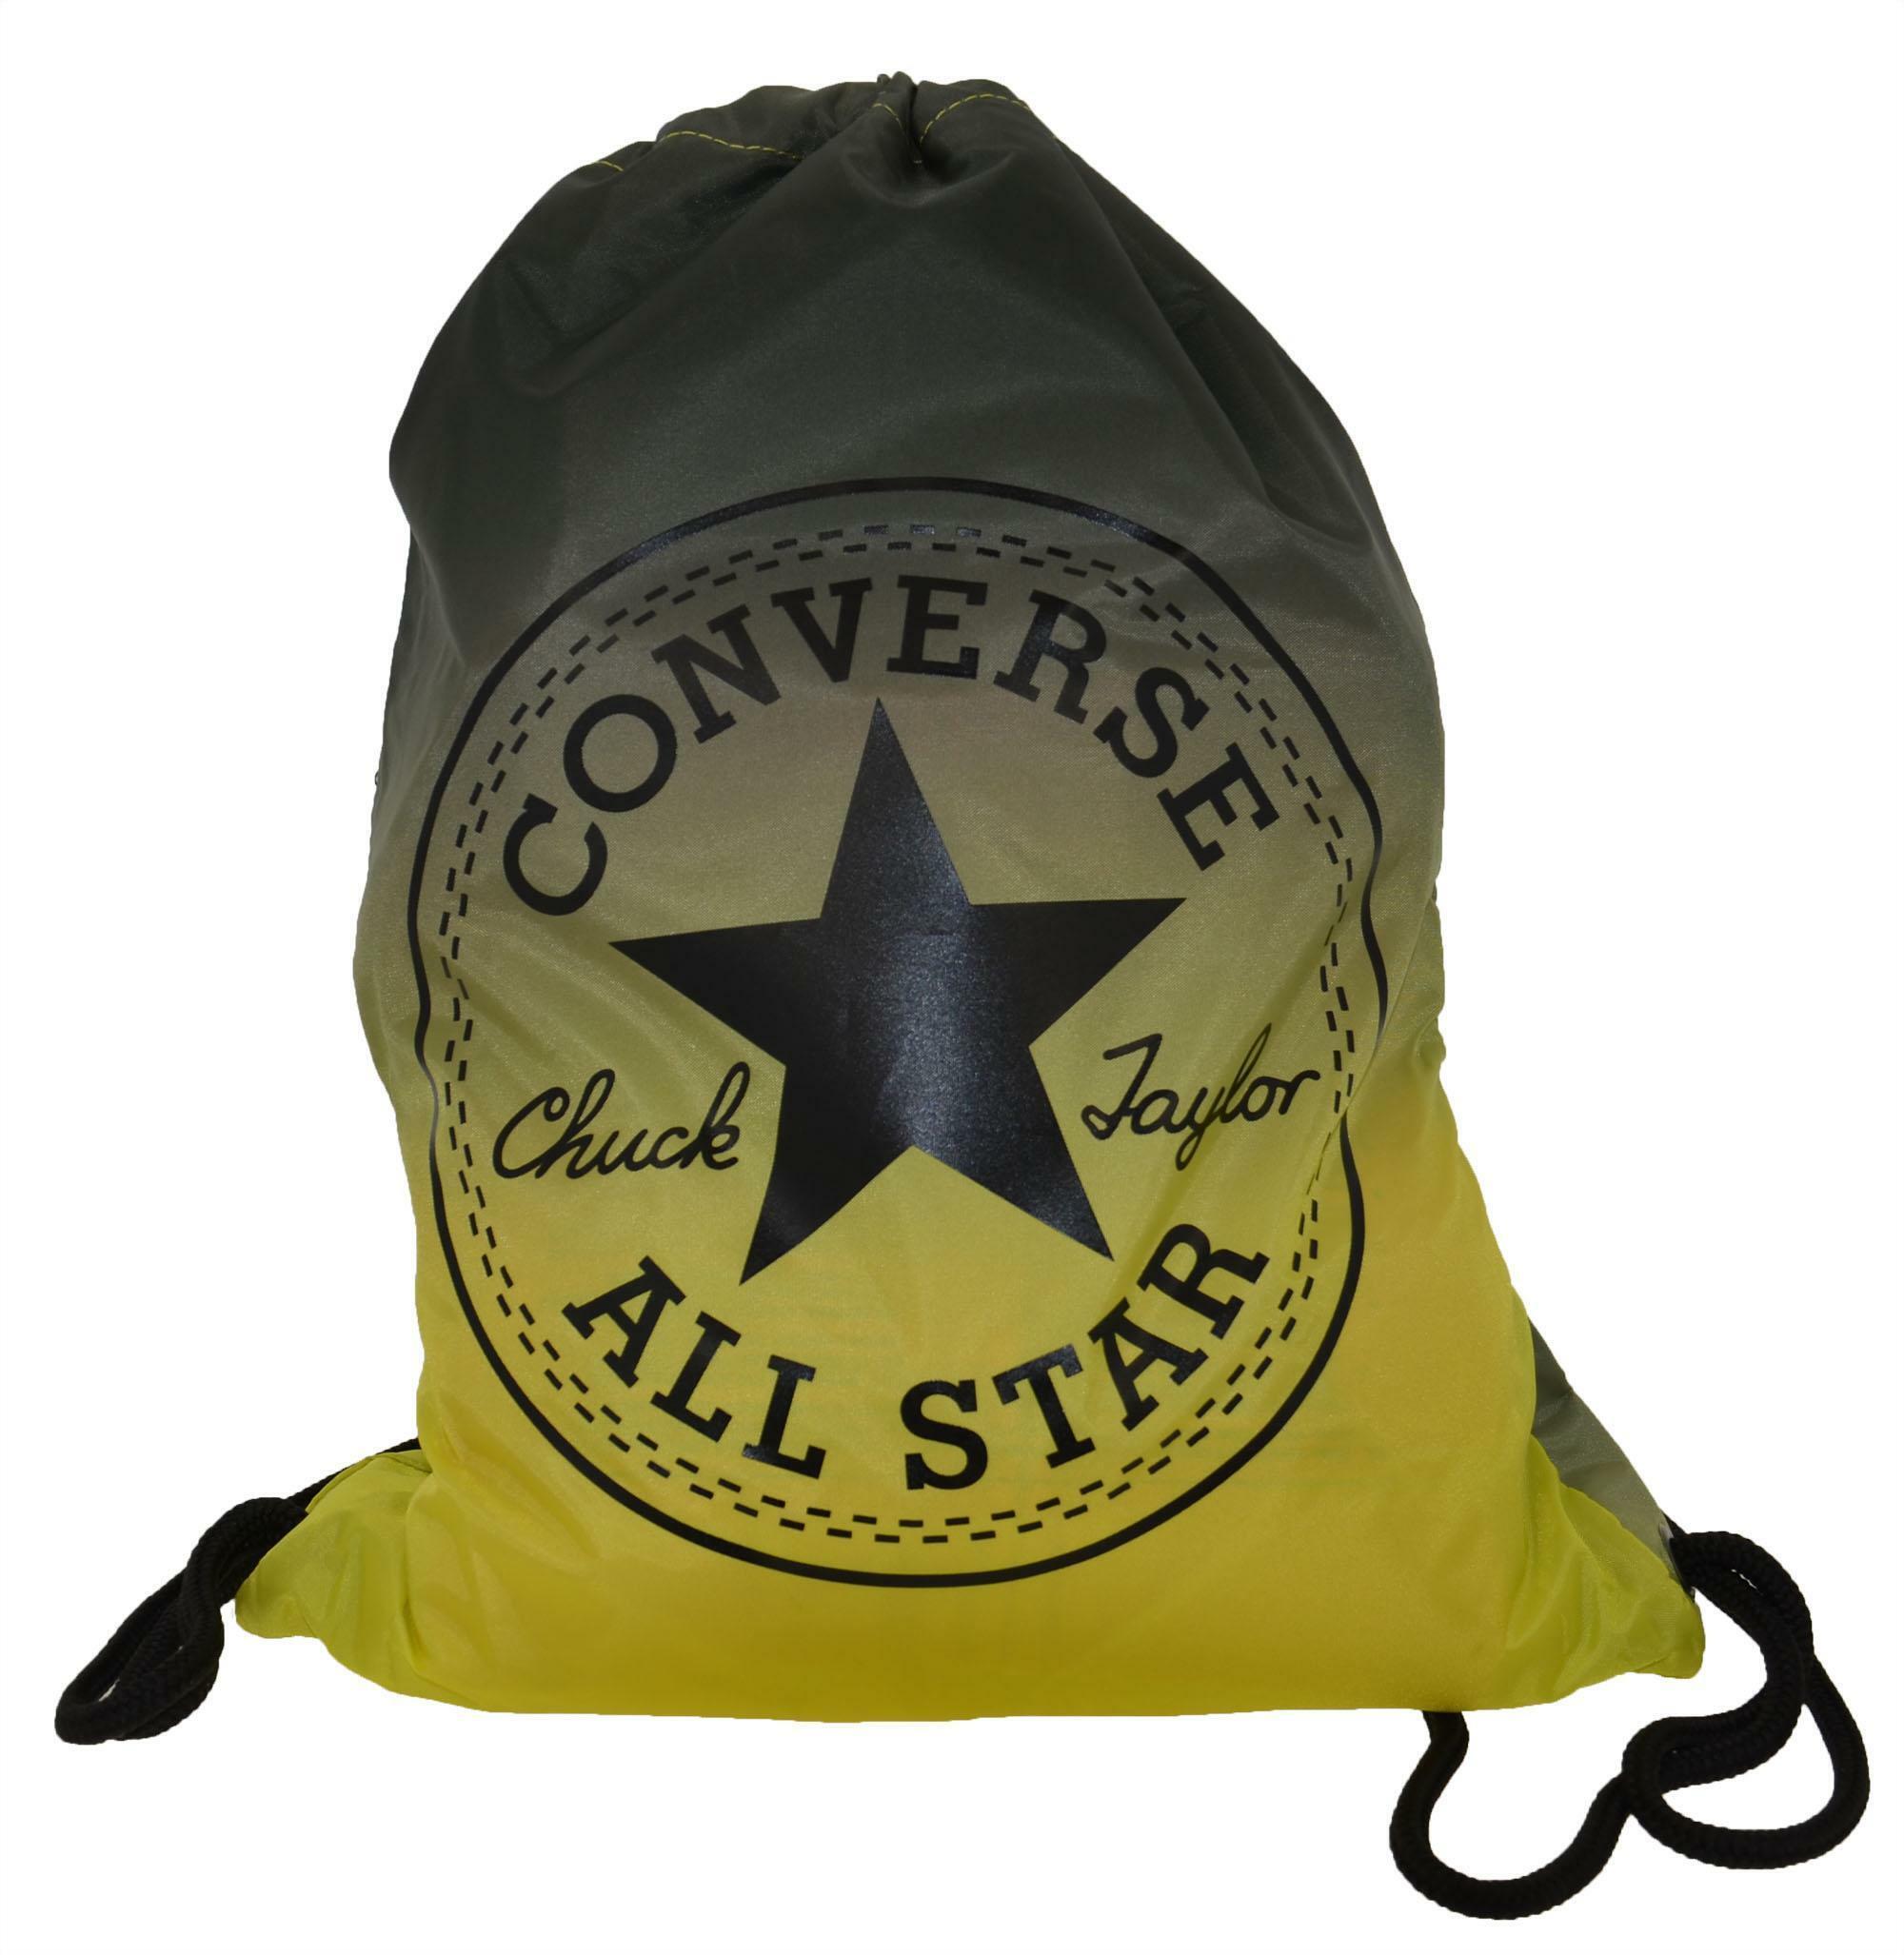 converse sacca gialla c45fgj10800